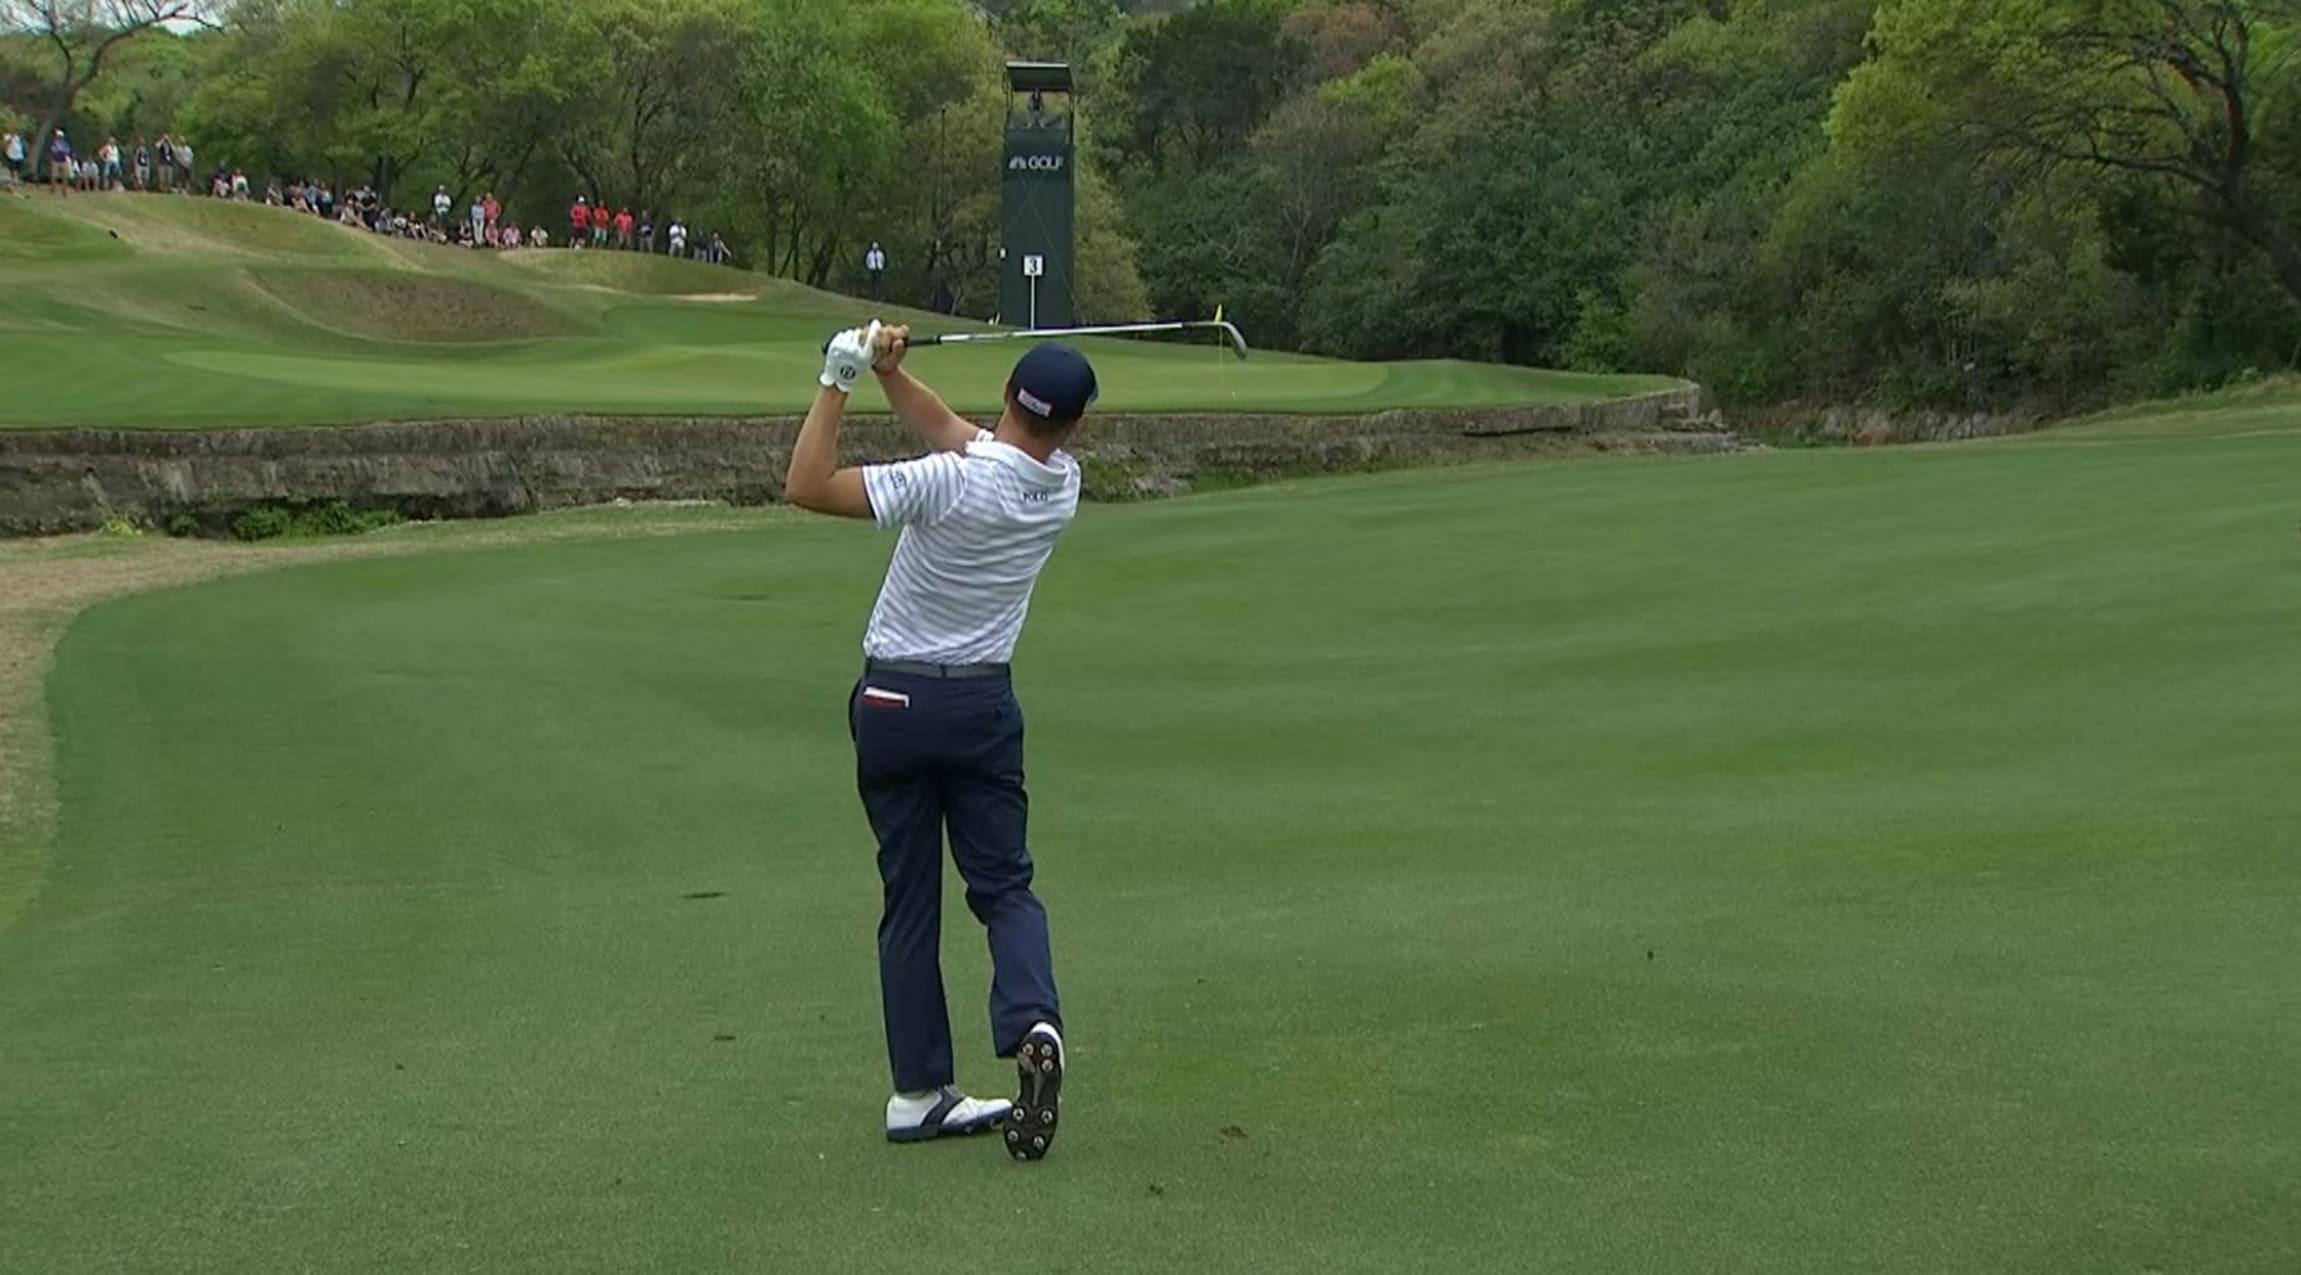 Justin Thomas PGA TOUR Profile - News, Stats, and Videos